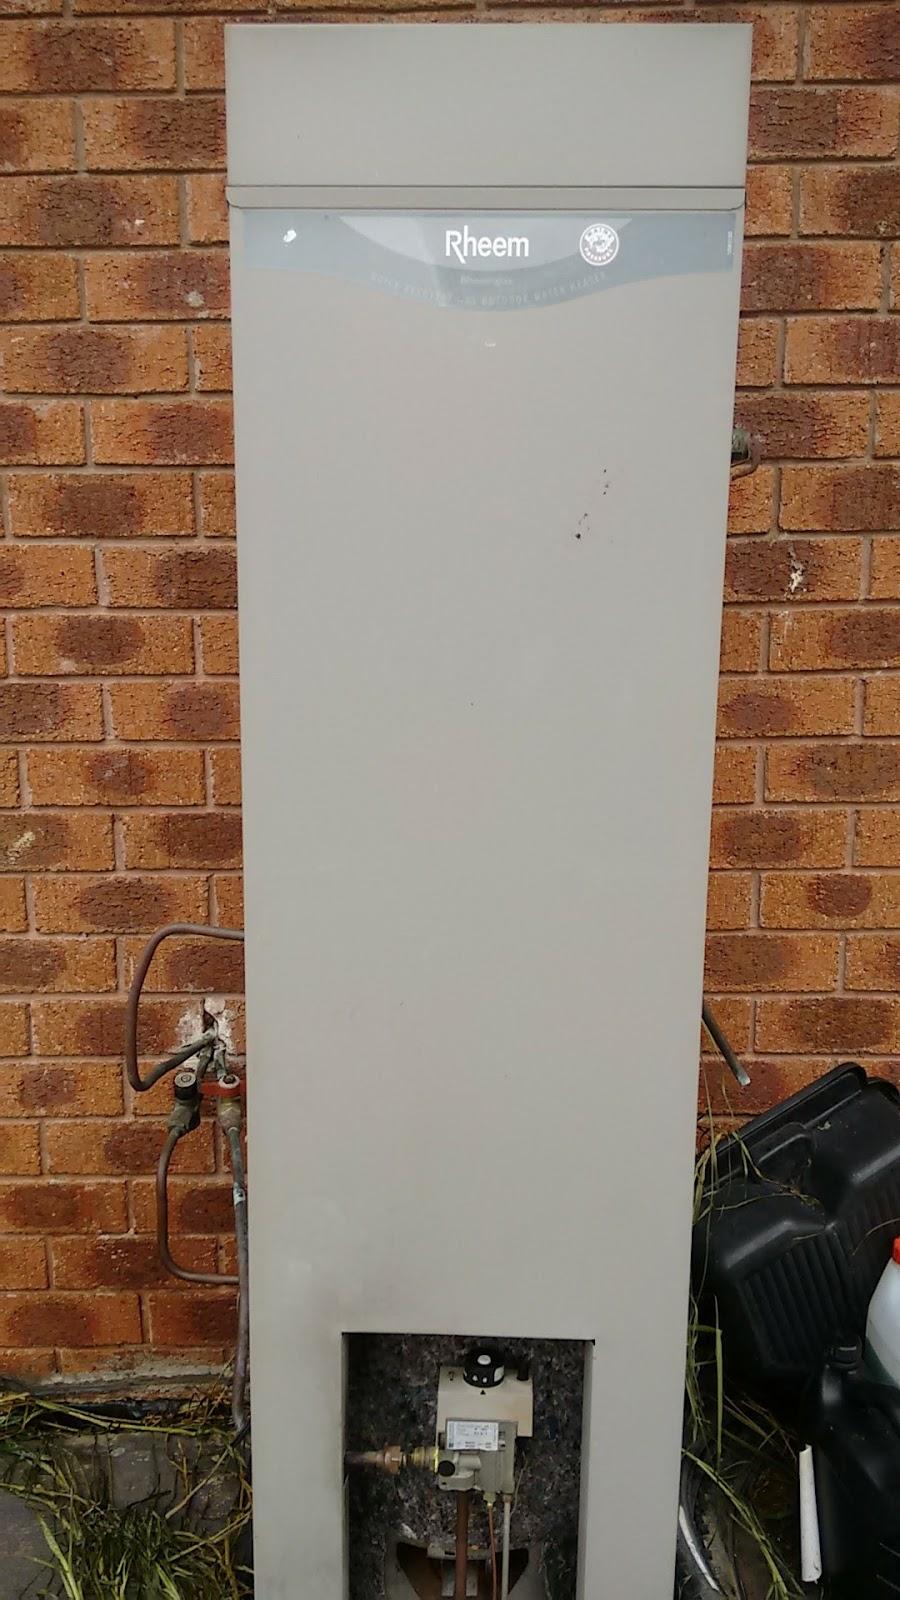 Fixed It Myself Rheem Water Heater Pilot Light Won T Stay Lit